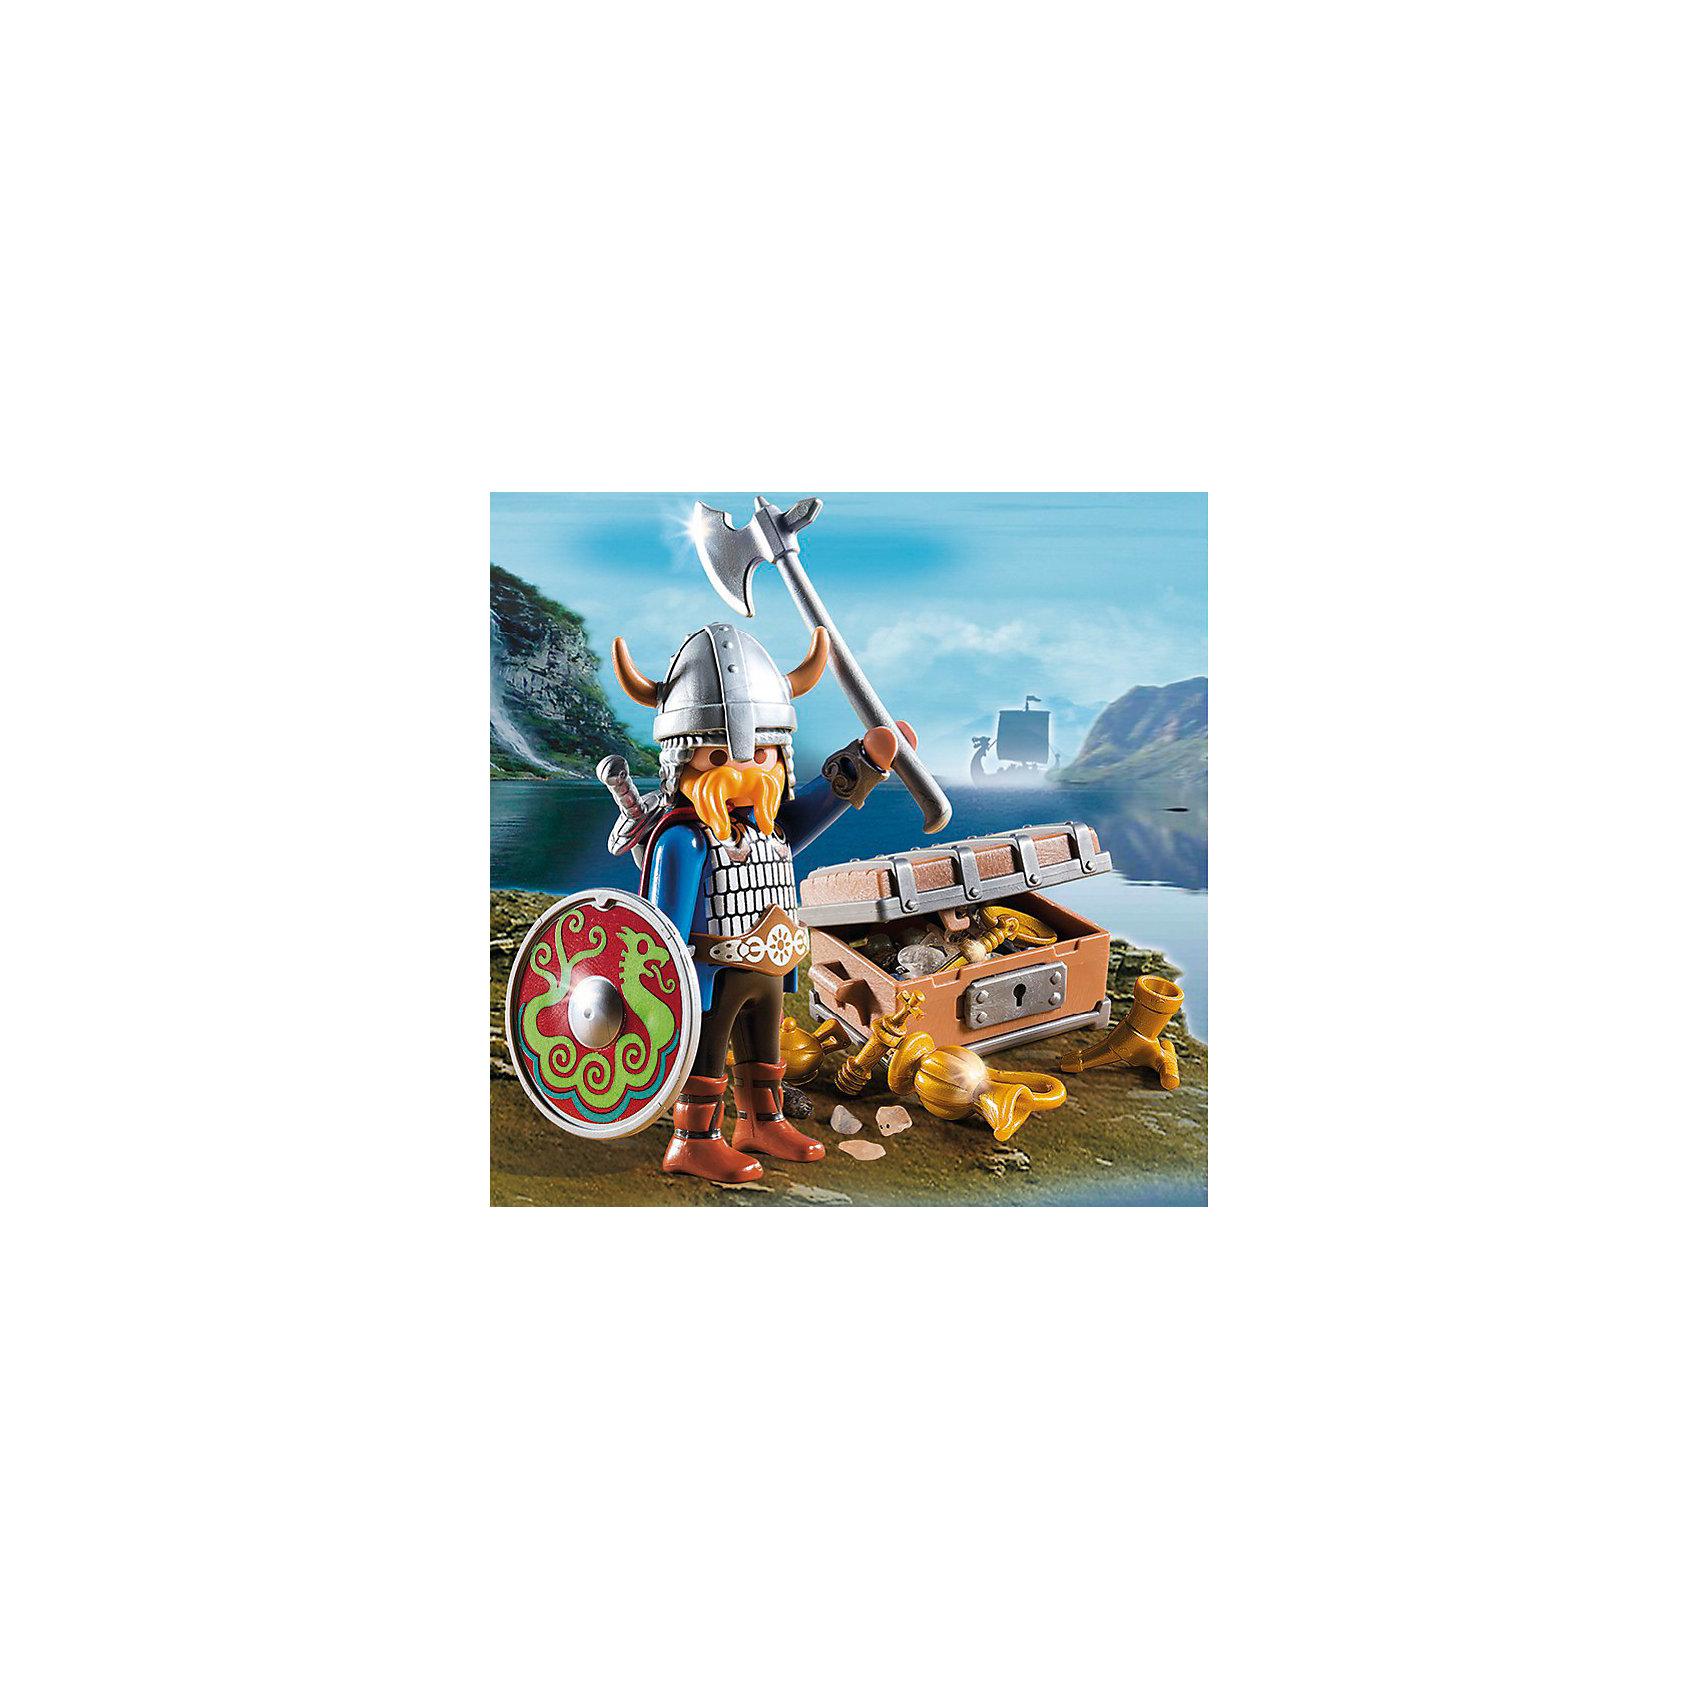 PLAYMOBIL® Экстра-набор: Викинг с сокровищами, PLAYMOBIL playmobil® экстра набор сёрфингист с доской playmobil